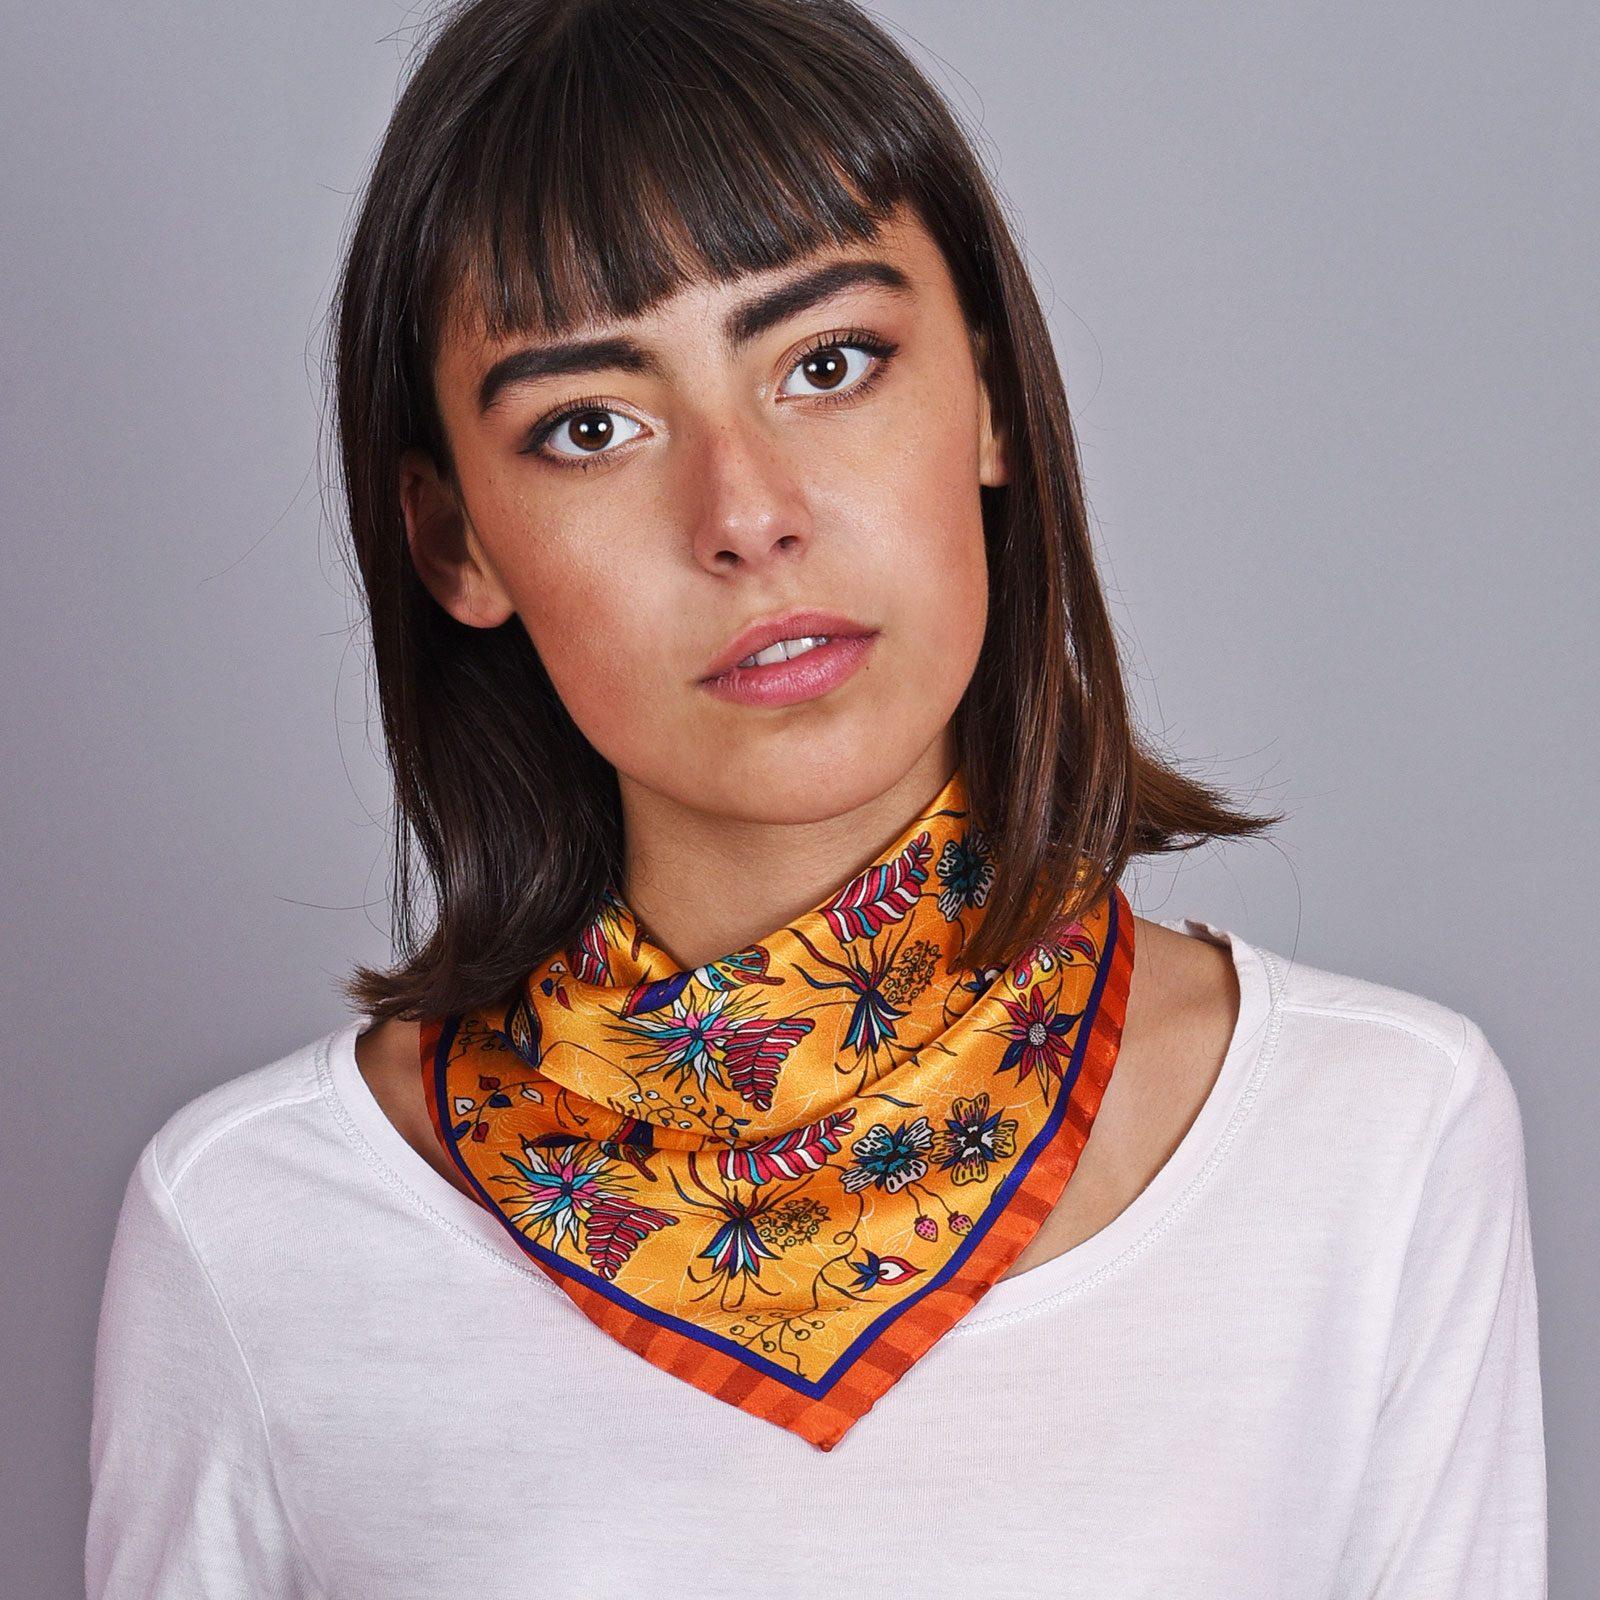 http://lookbook.allee-du-foulard.fr/wp-content/uploads/2018/12/AT-04603-VF16-1-carre-soie-femme-jaune-orange-made-in-italie-1600x1600.jpg